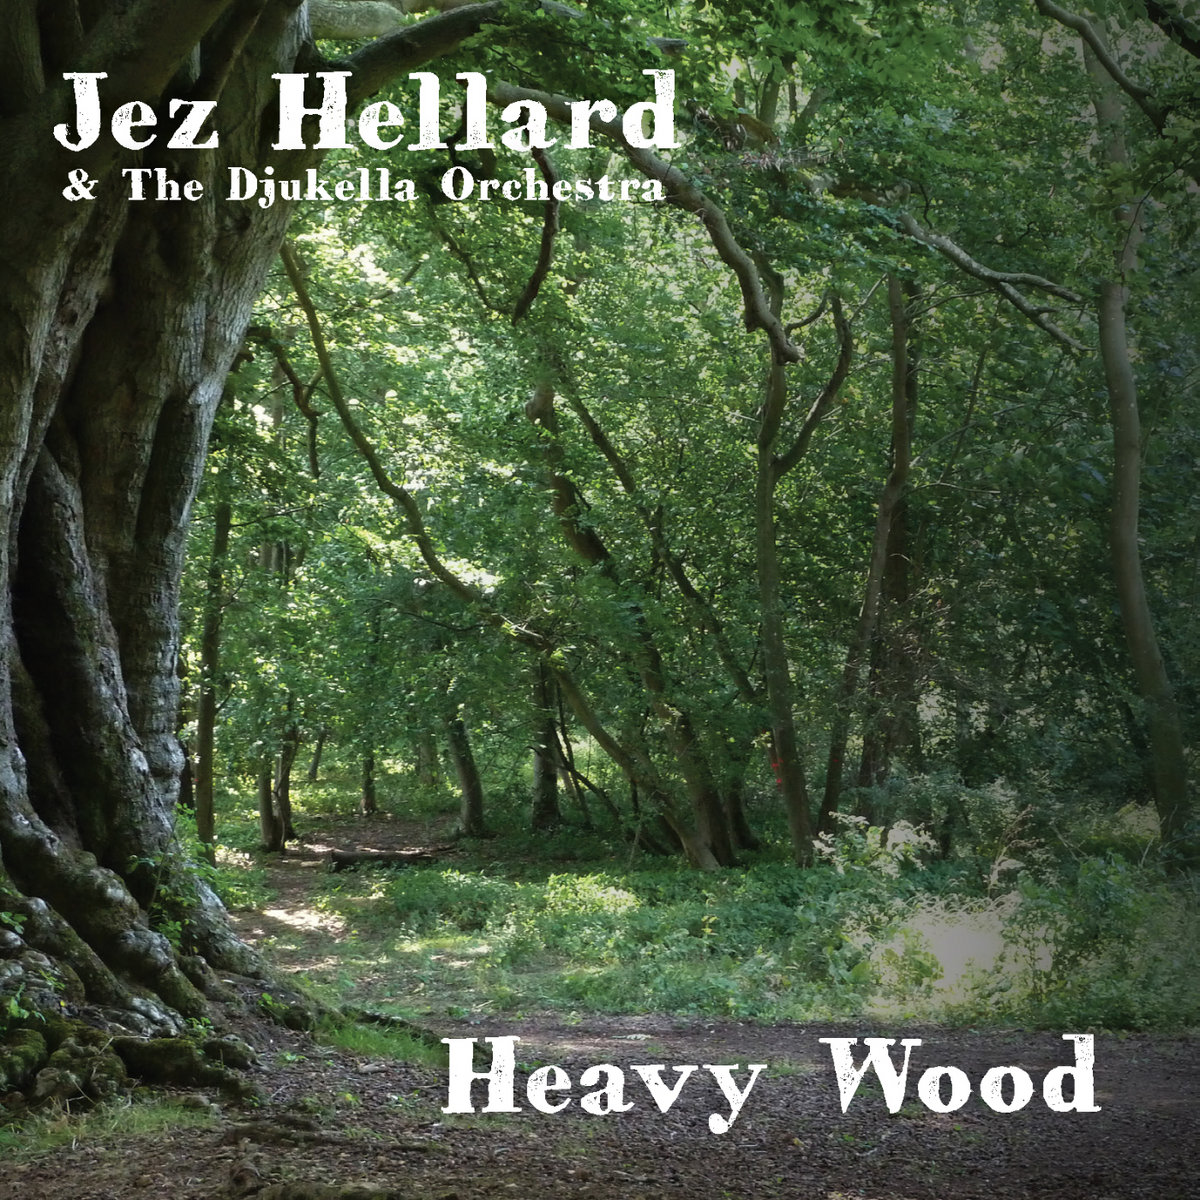 Image result for jez hellard heavy wood